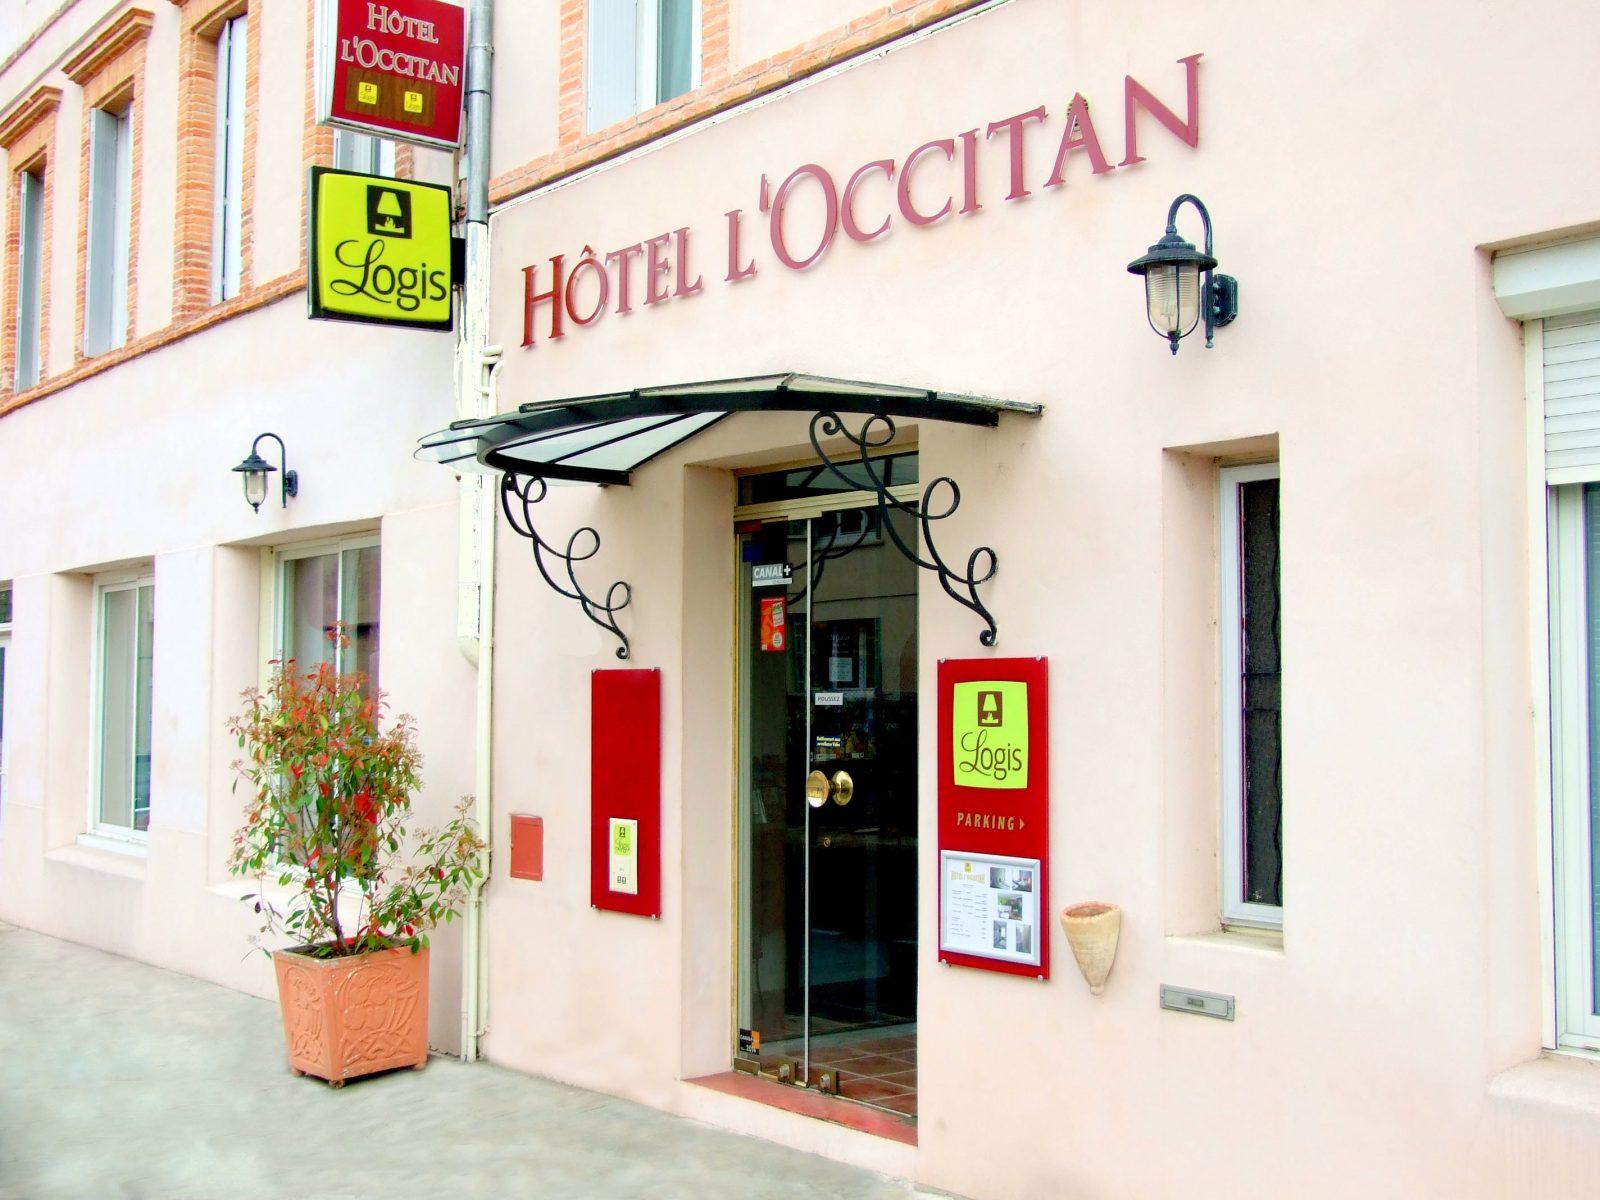 Hôtel l'Occitan